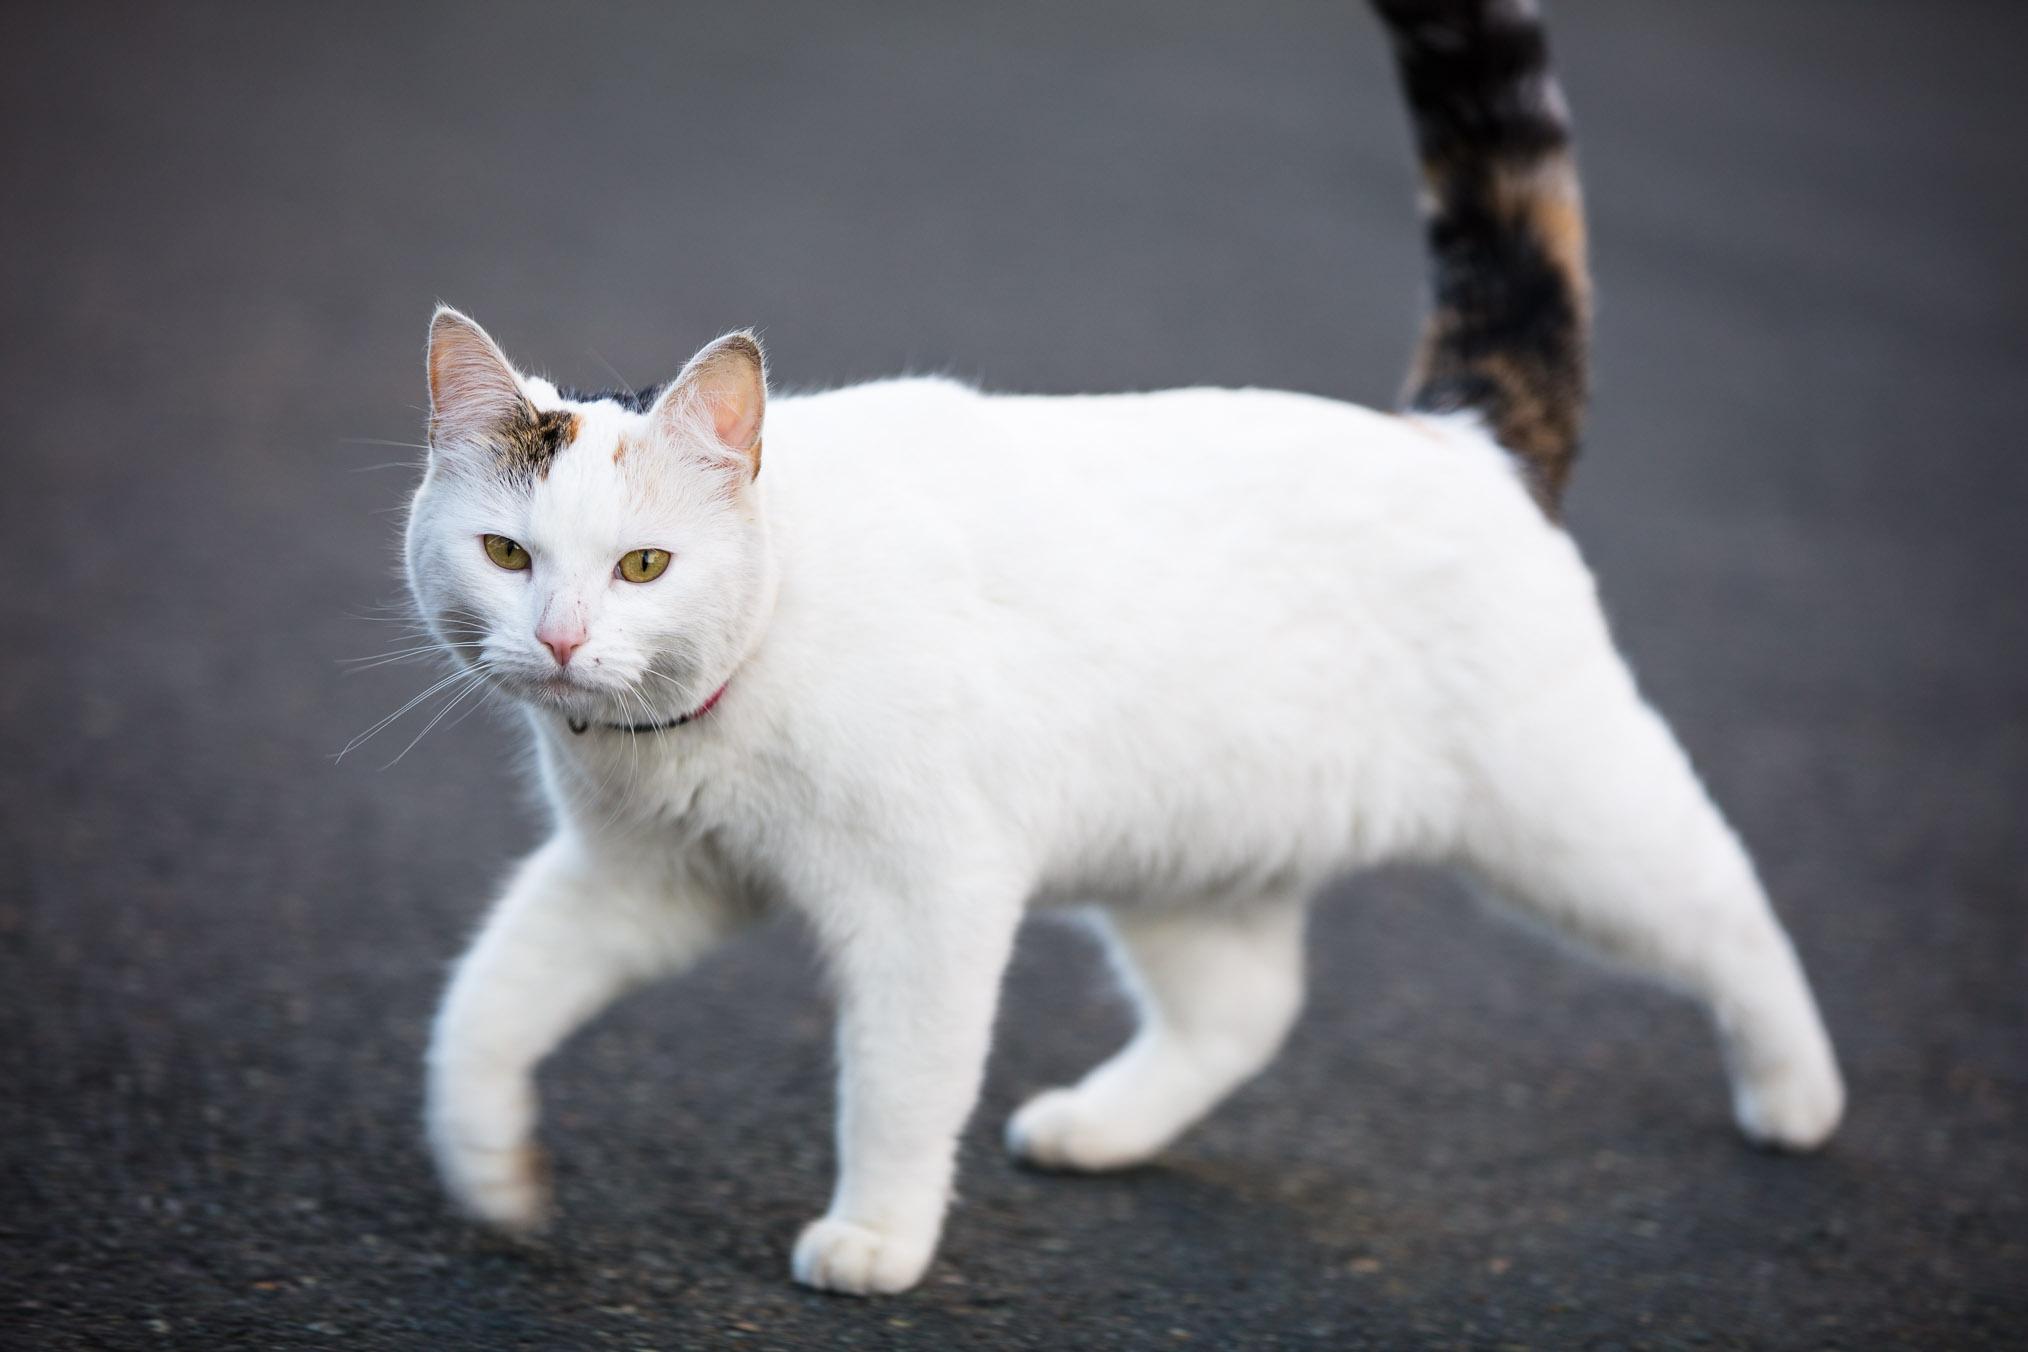 cat in town two.jpg